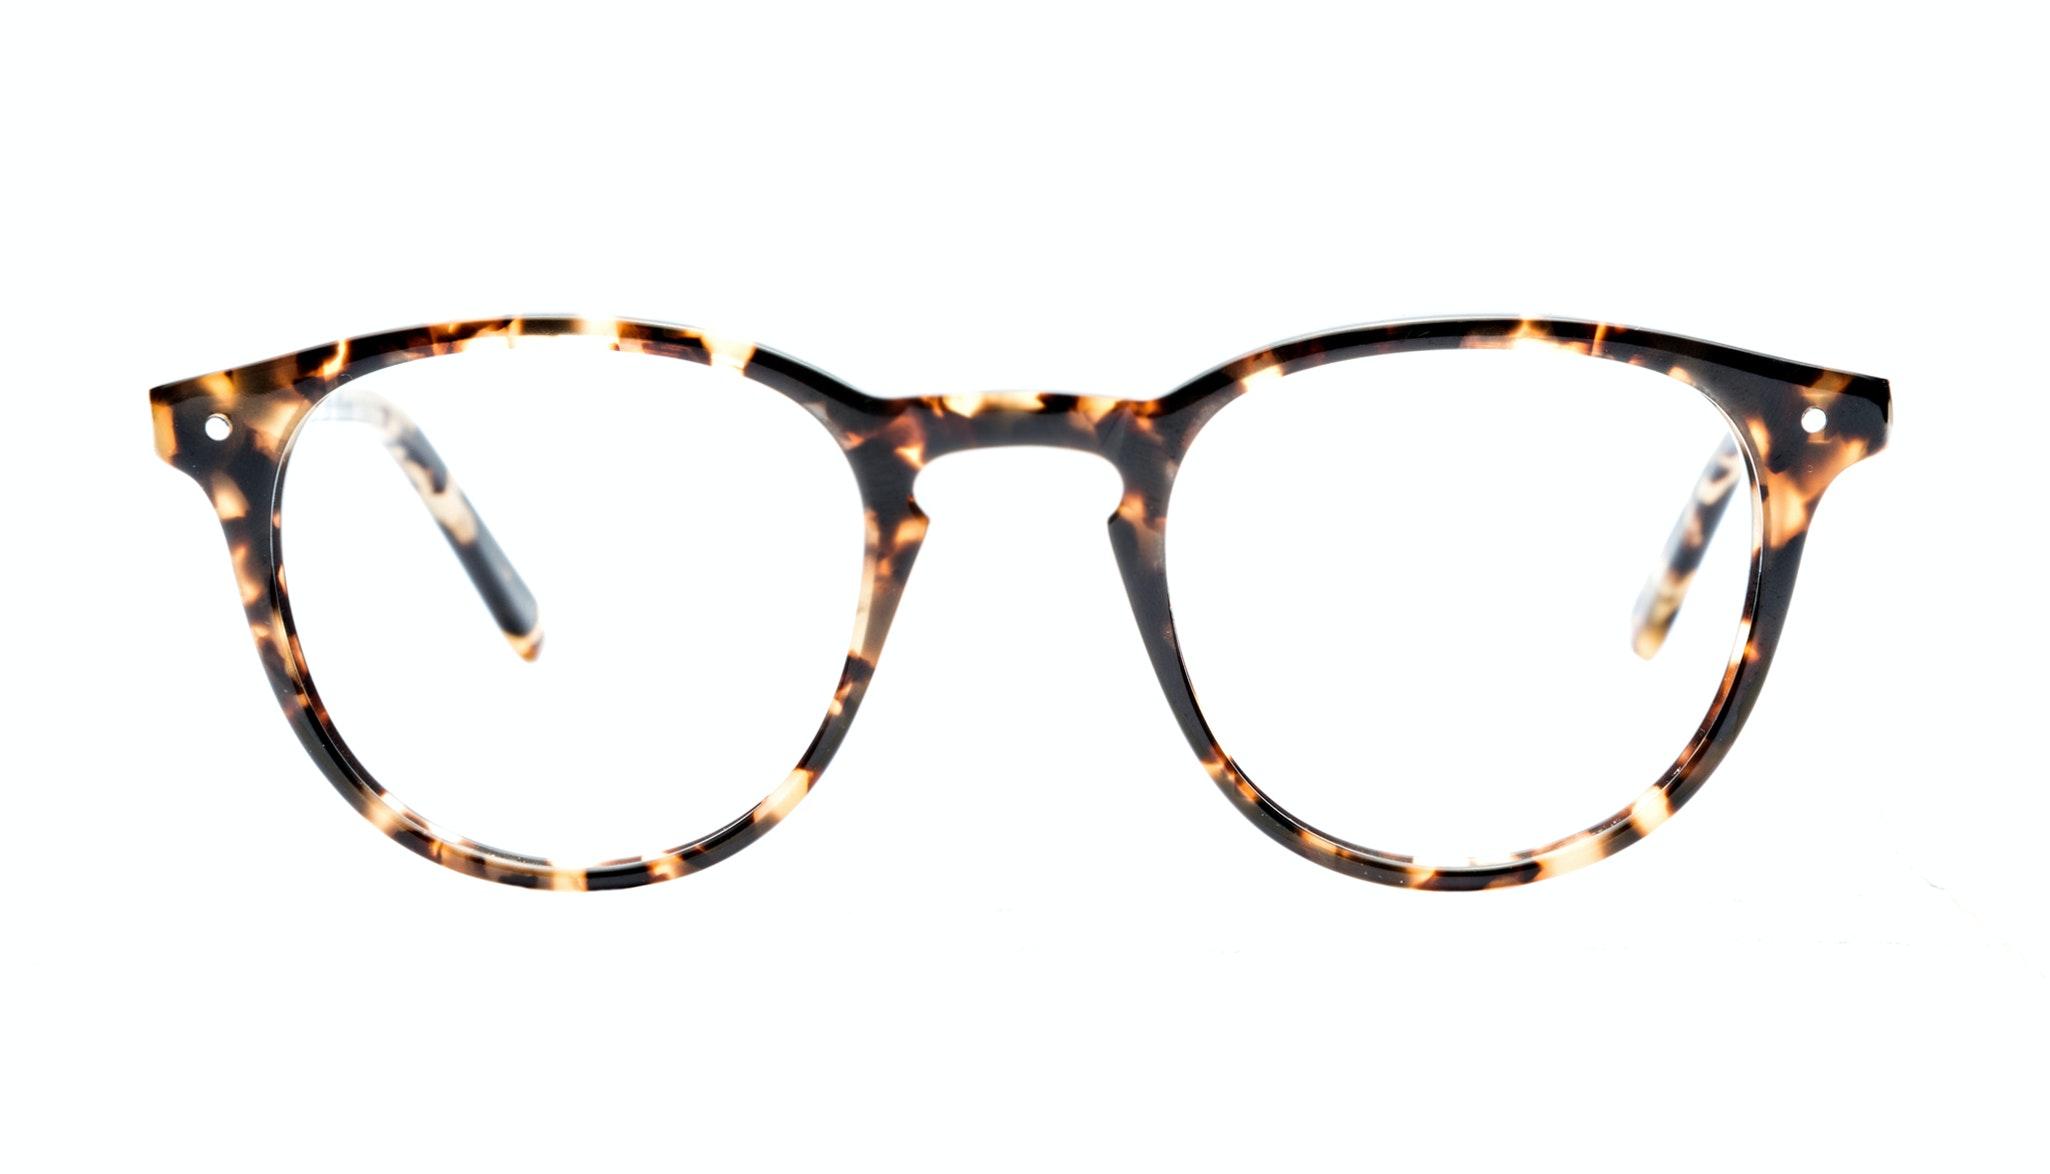 Affordable Fashion Glasses Round Eyeglasses Men Cult Dark Tortoise